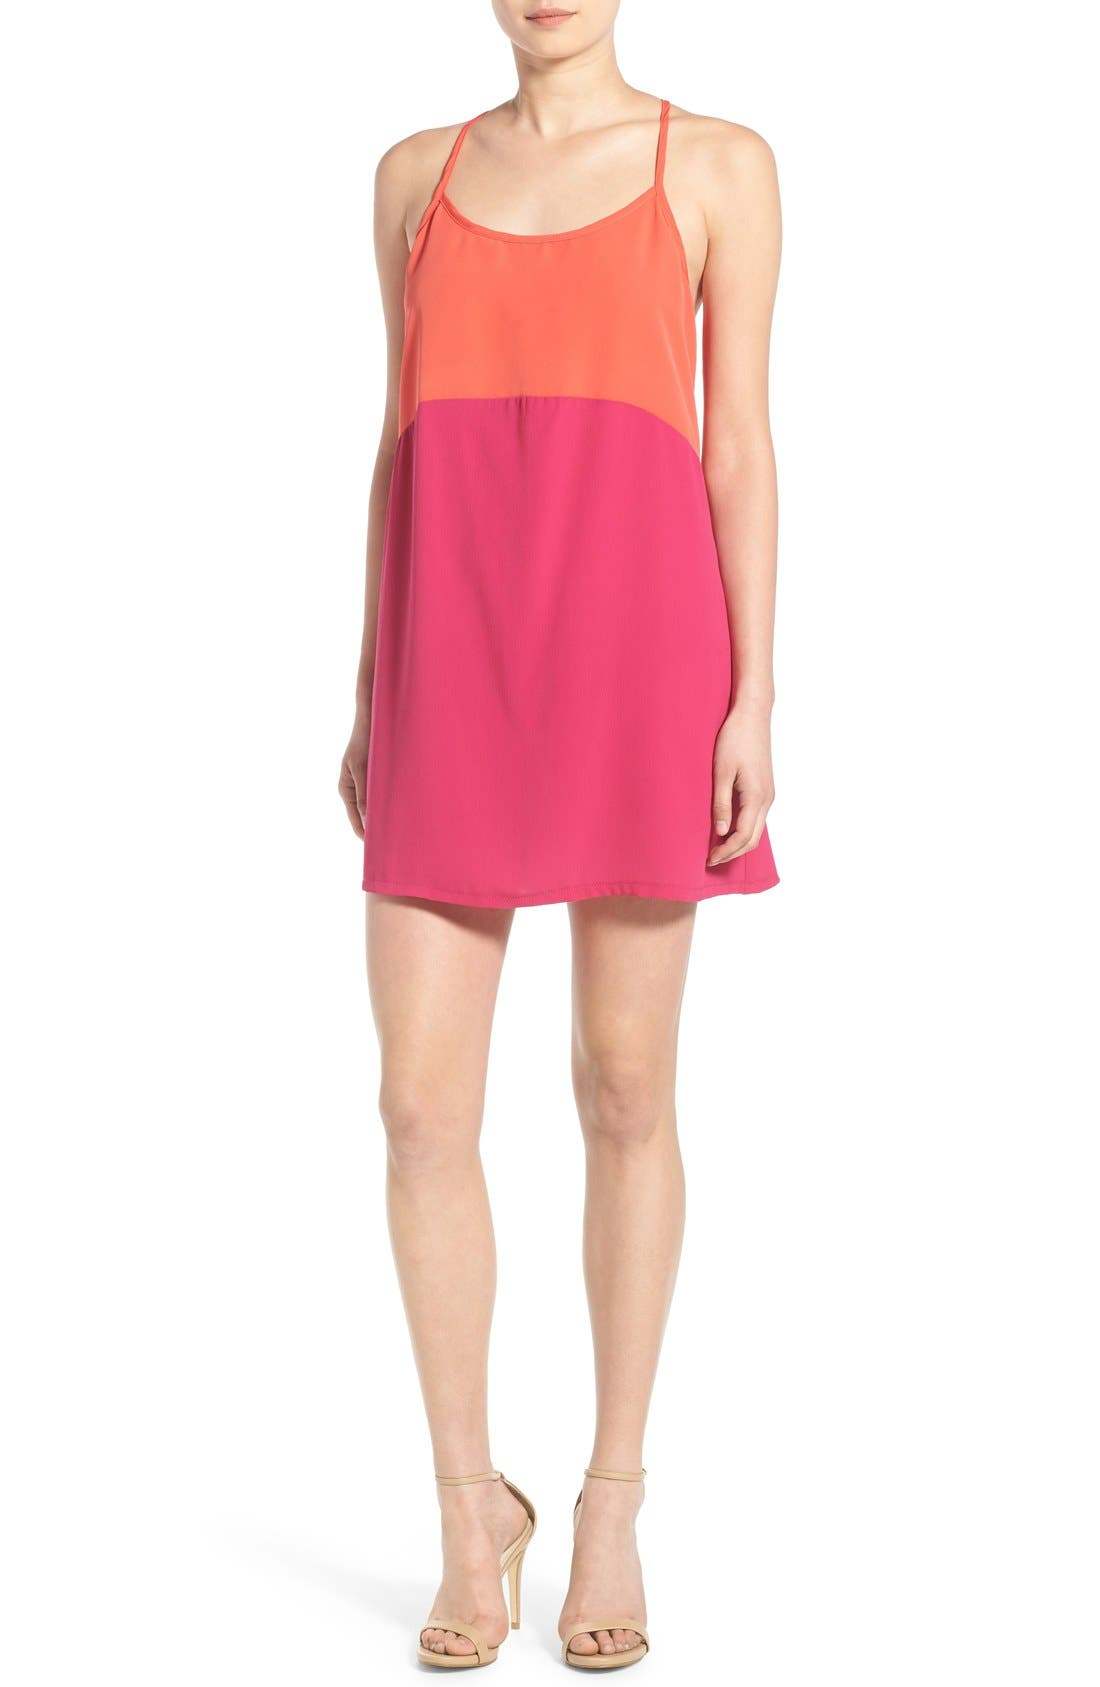 Alternate Image 1 Selected - Mimi Chica Colorblock Racerback Tank Dress